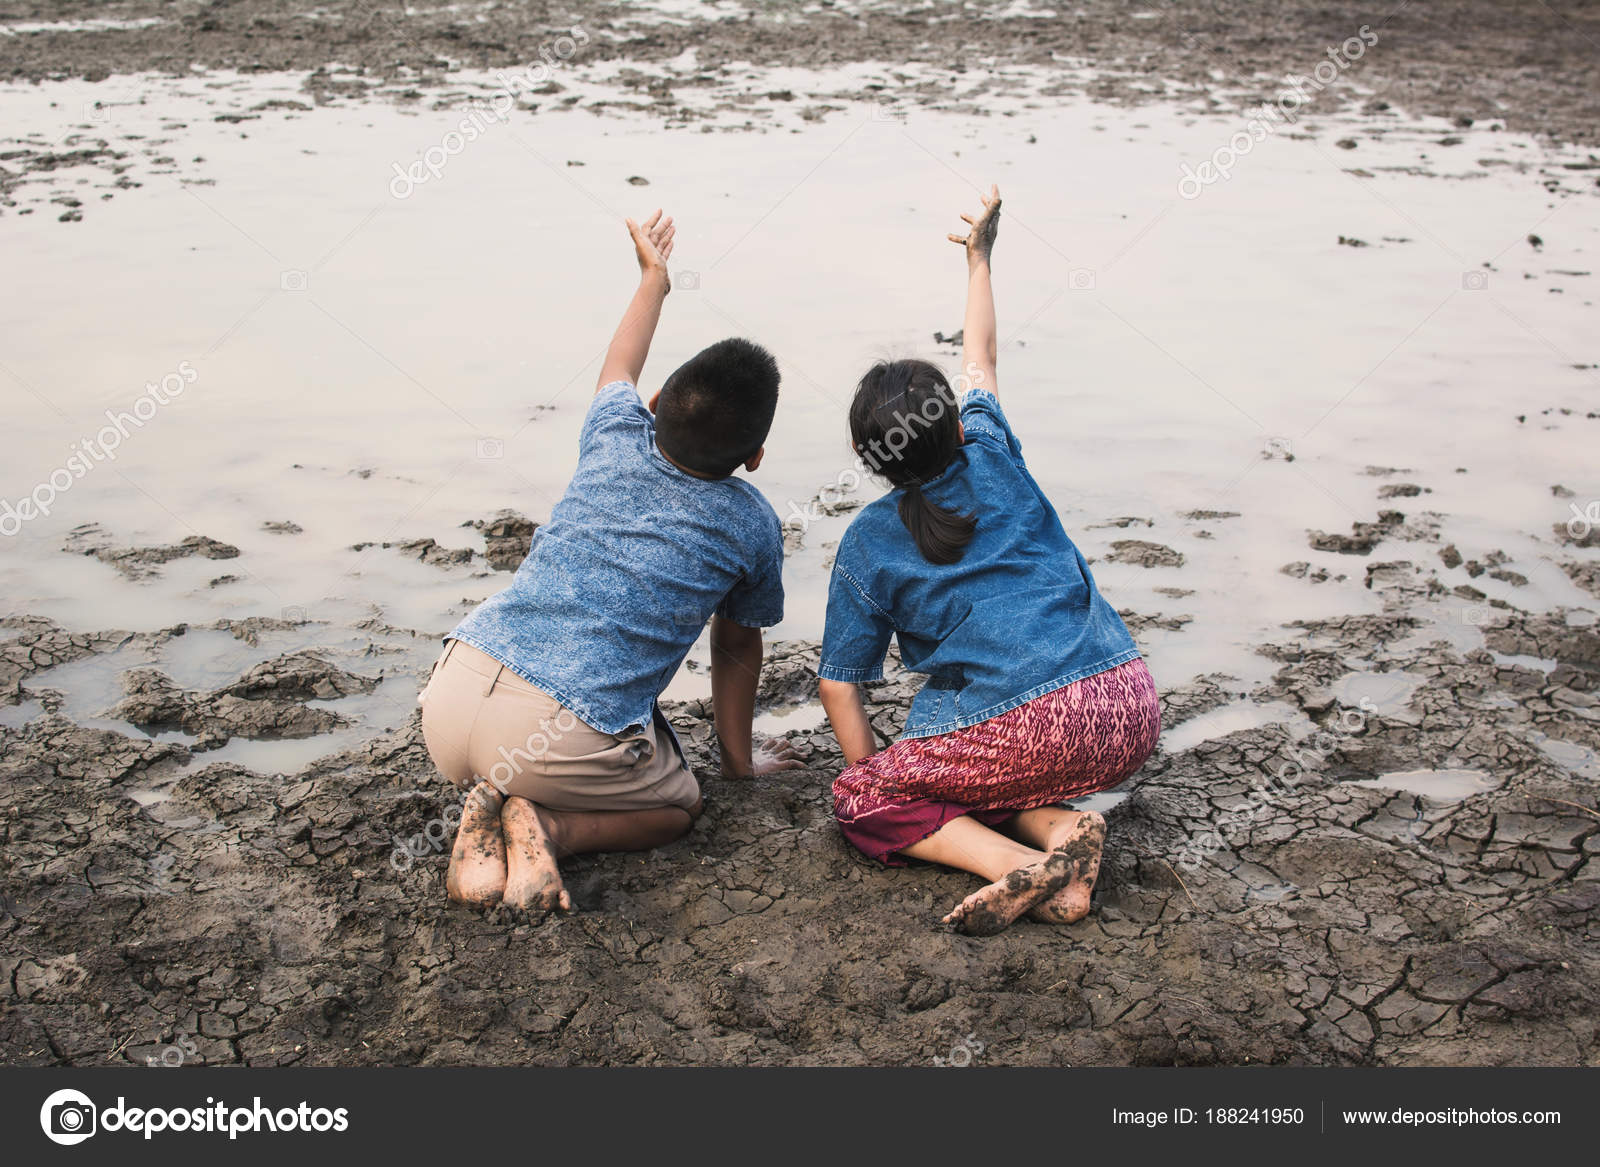 https://st3.depositphotos.com/8571010/18824/i/1600/depositphotos_188241950-stock-photo-sad-boy-girl-praying-rain.jpg